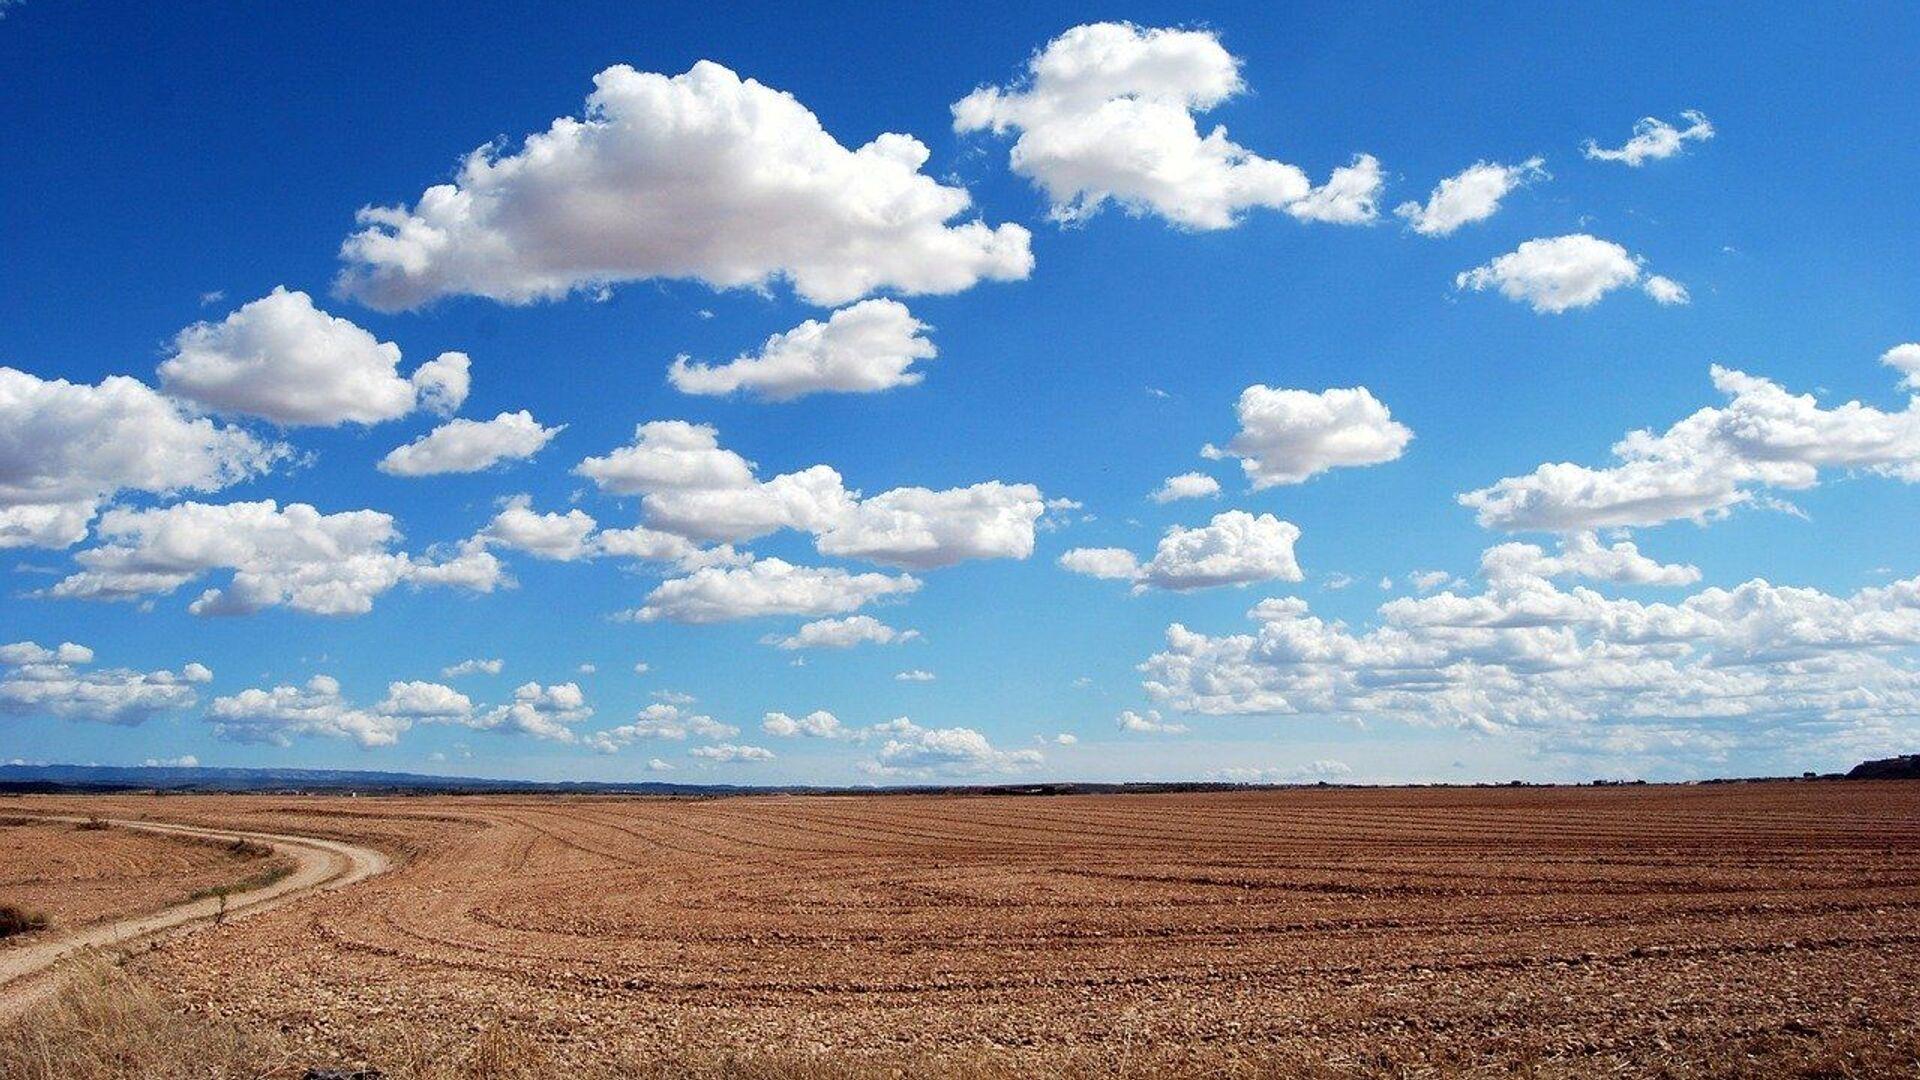 Nubes cumulus - Sputnik Mundo, 1920, 21.04.2021